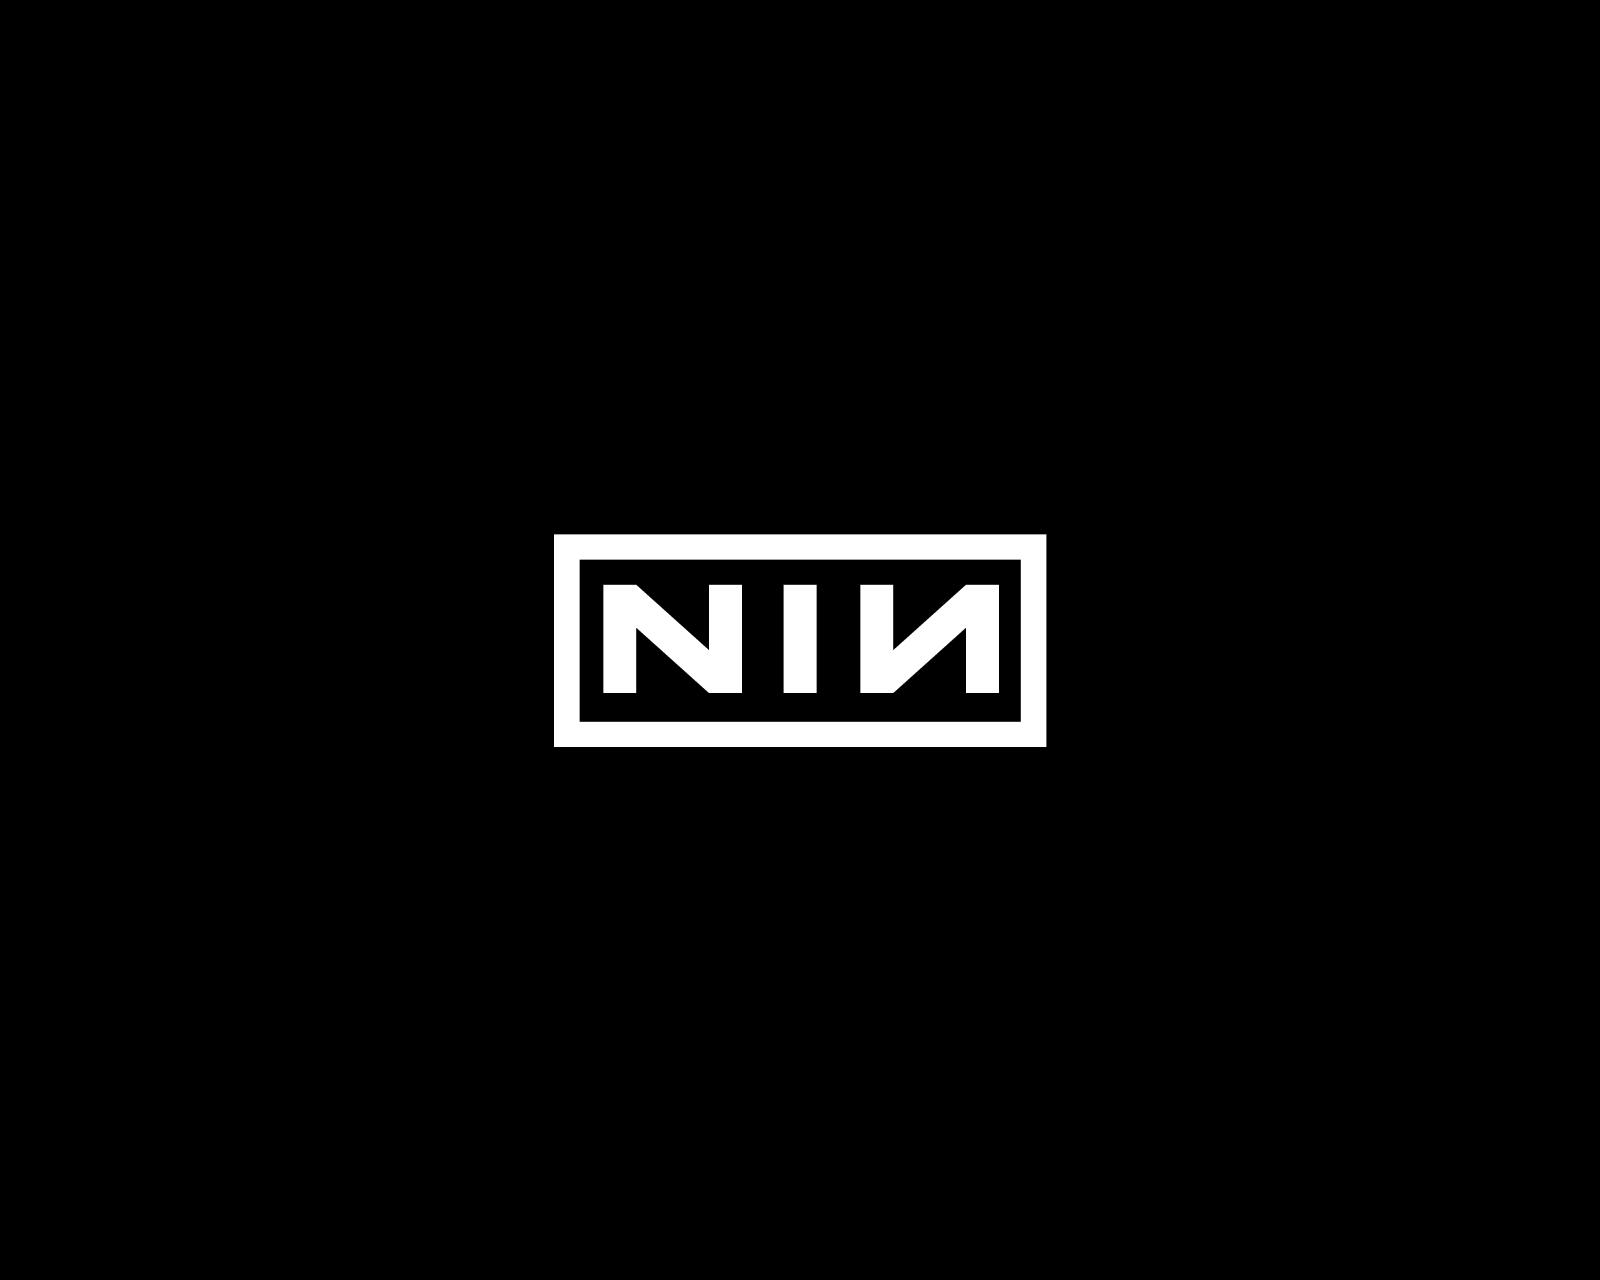 Nine inch nails Logos.